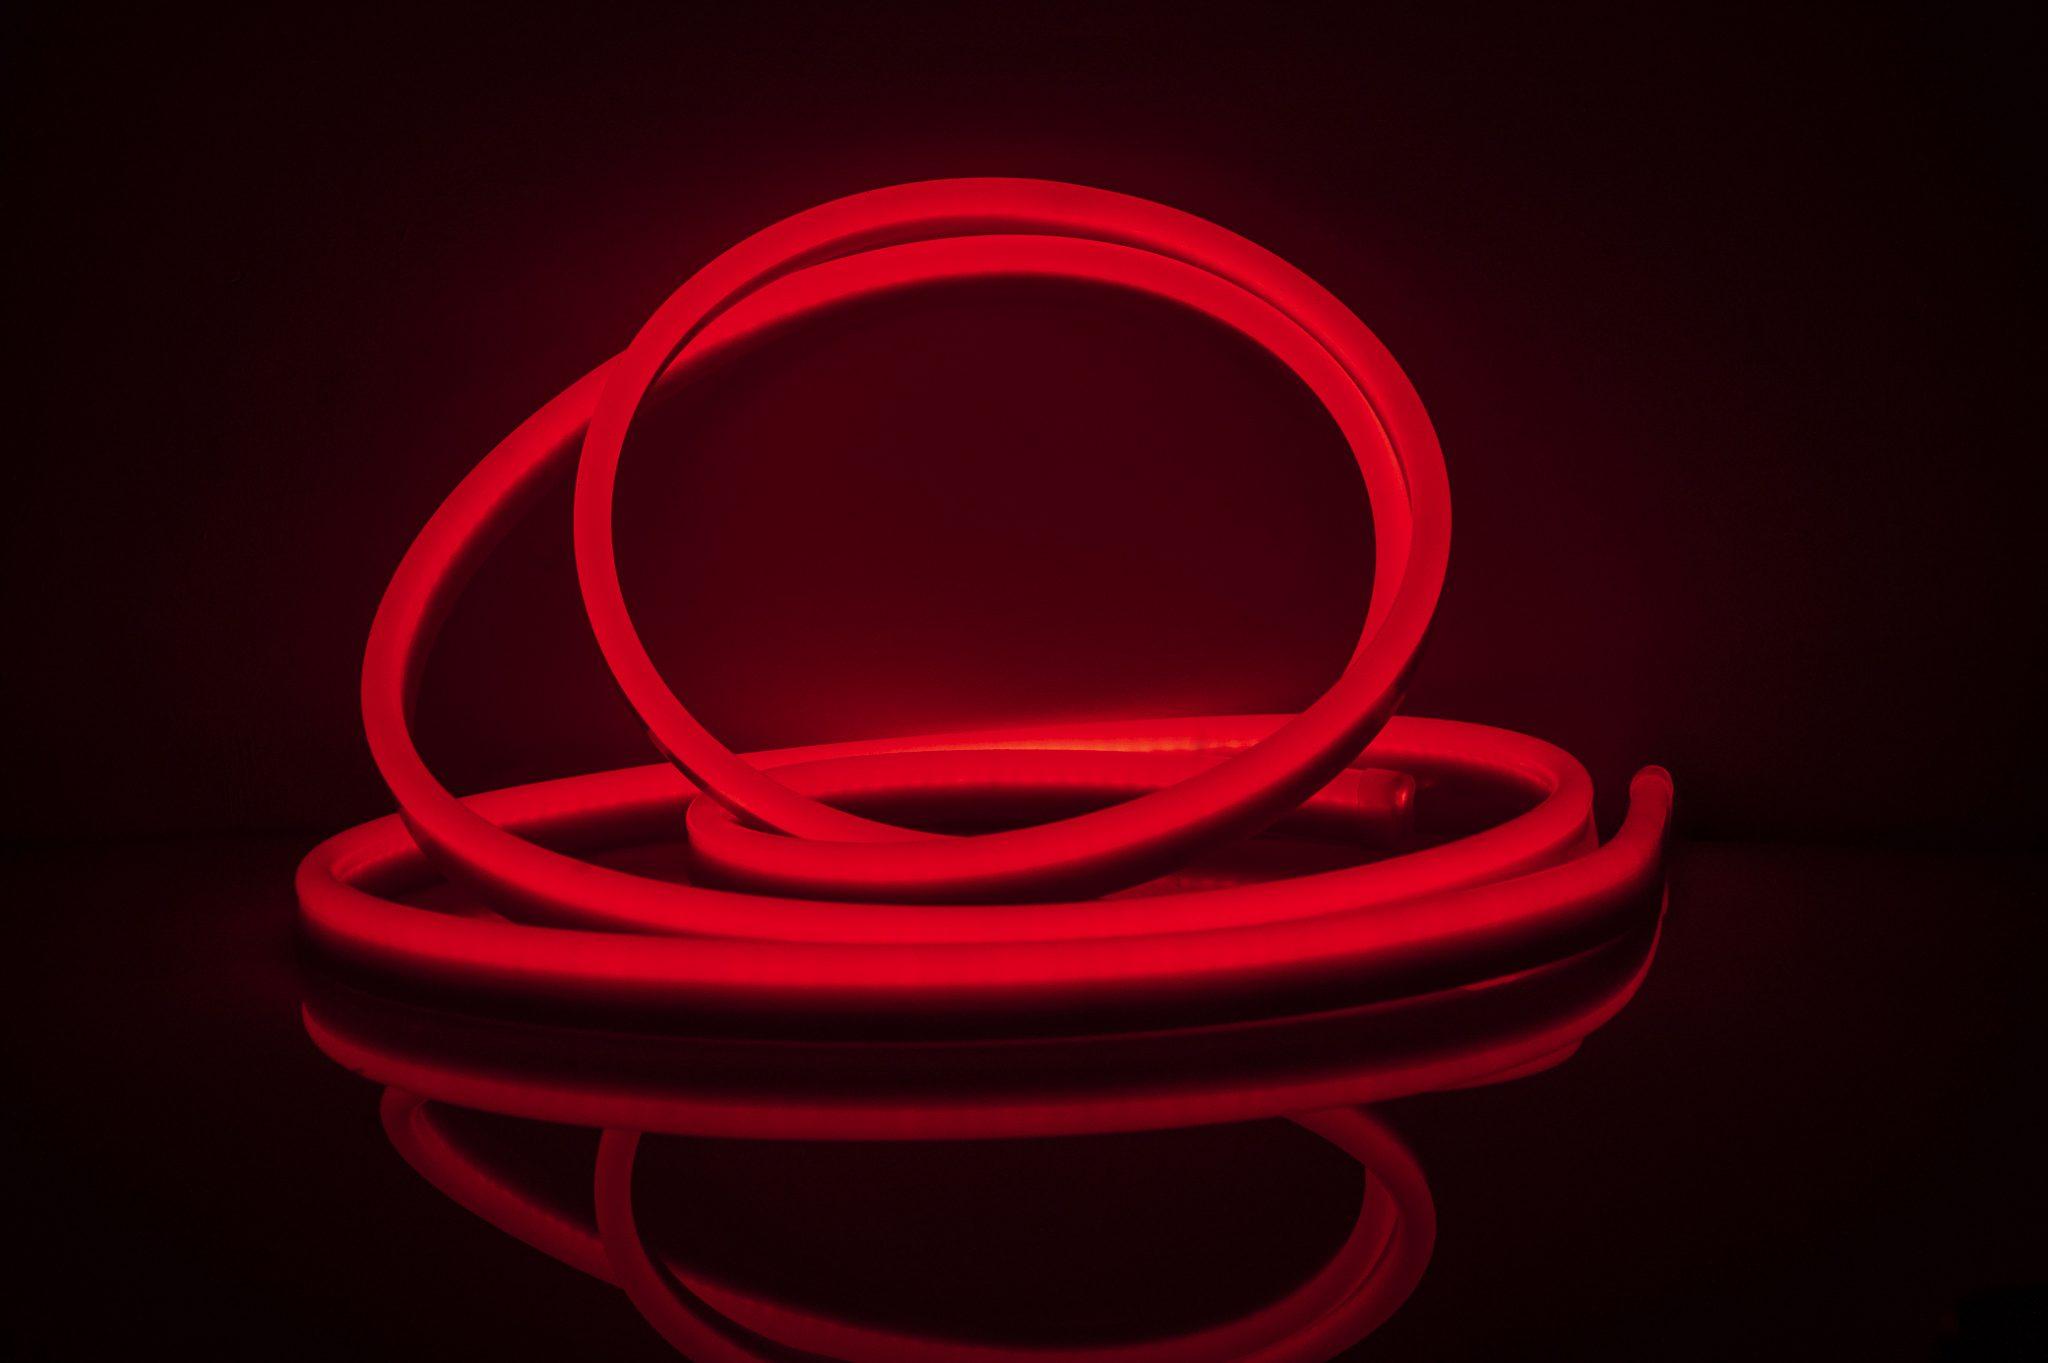 Neon10 1225 RT Red